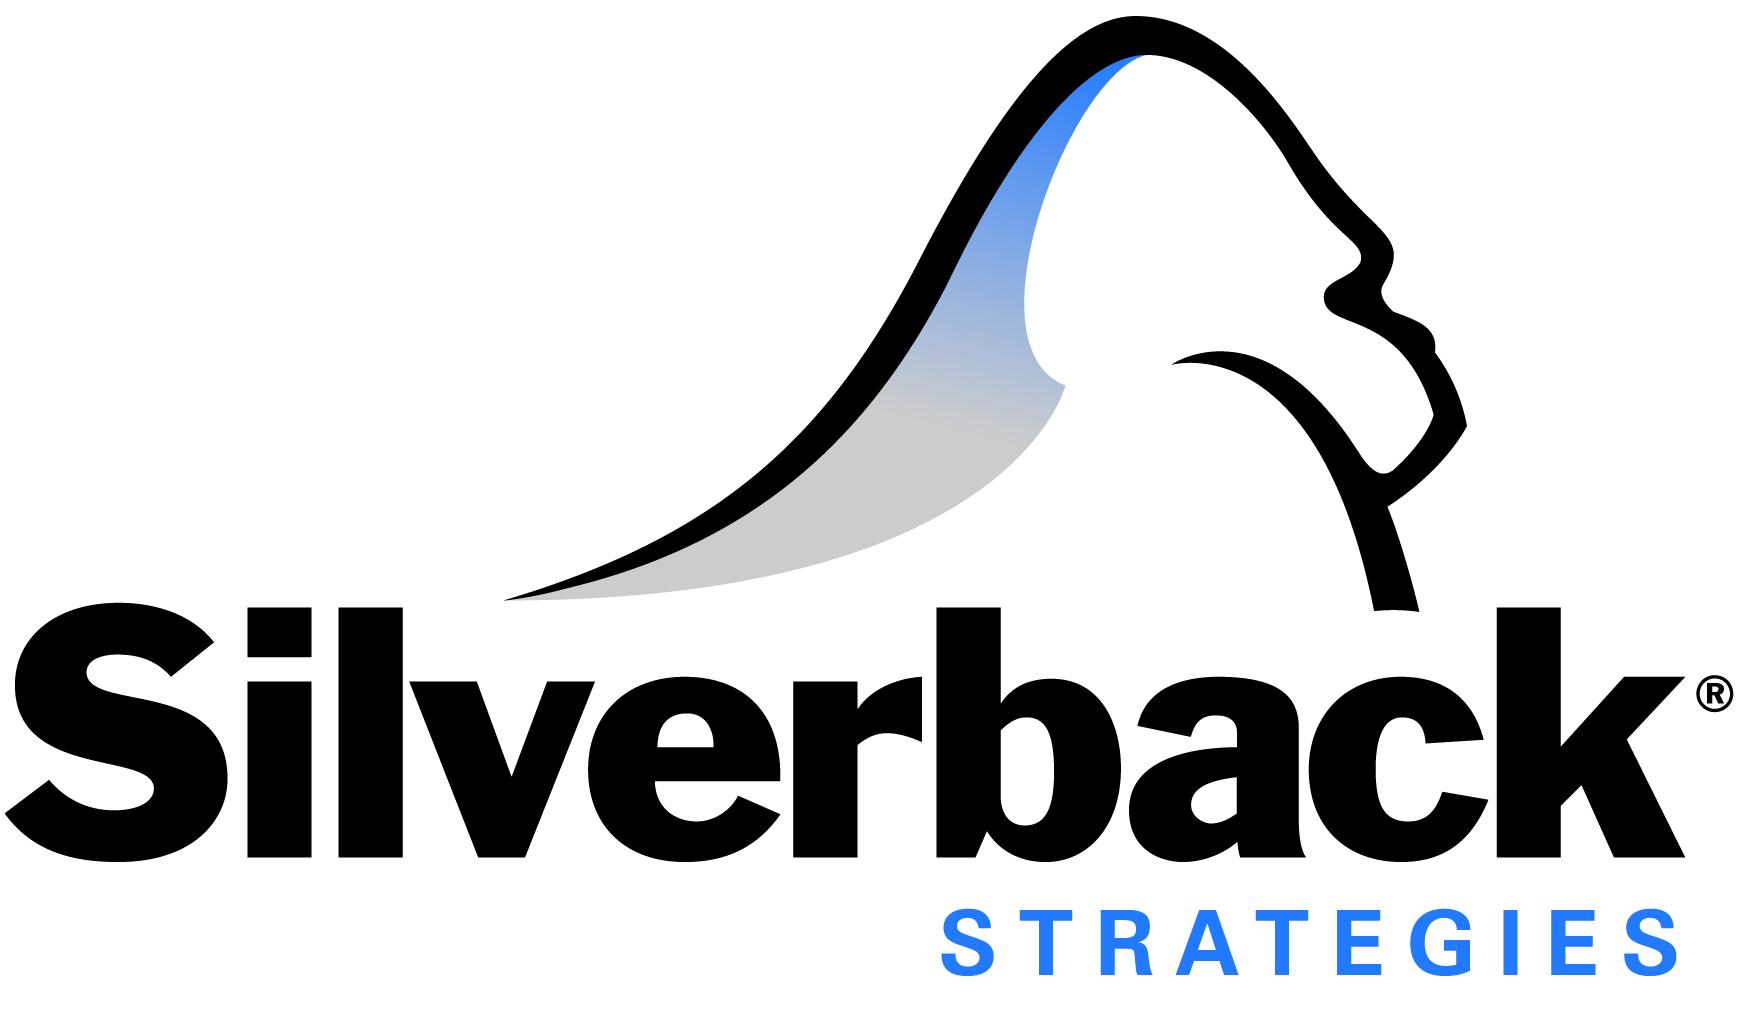 Silverback Strategies, Inc.